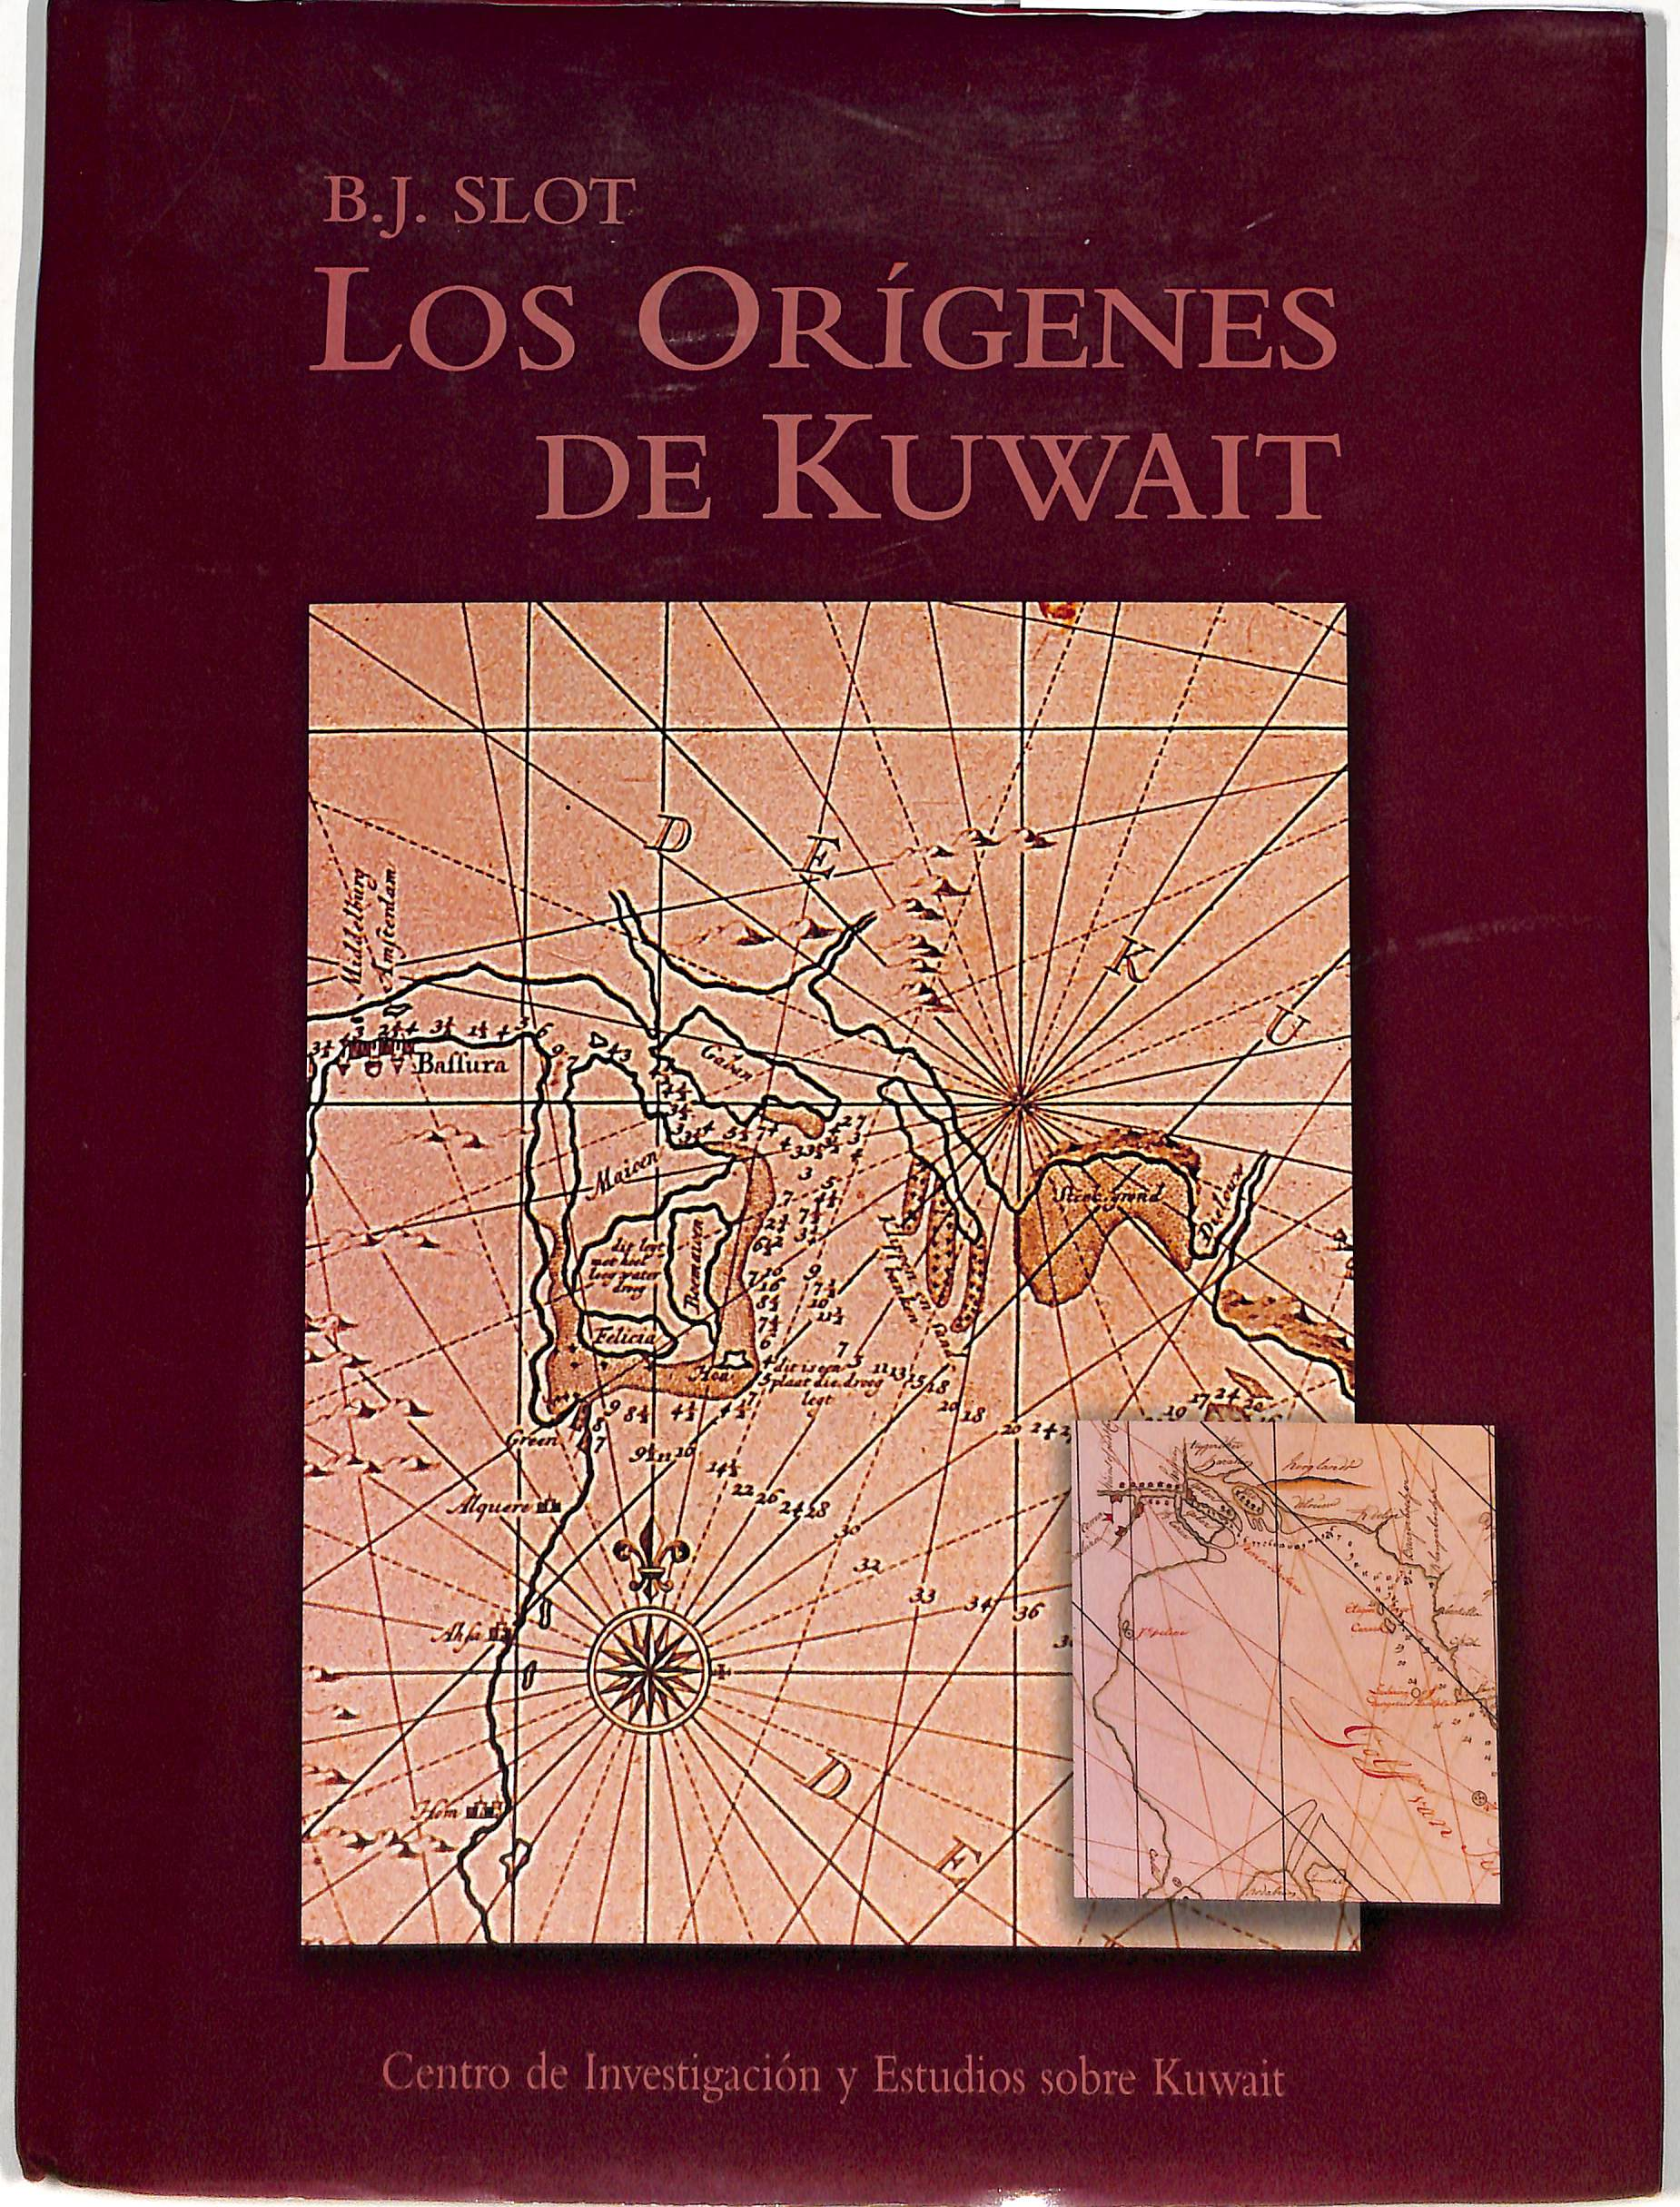 BIBLIOTECA DRÁCULA LA TUMBA DE DRÁCULA - Marv Wolfman / Gene Colan